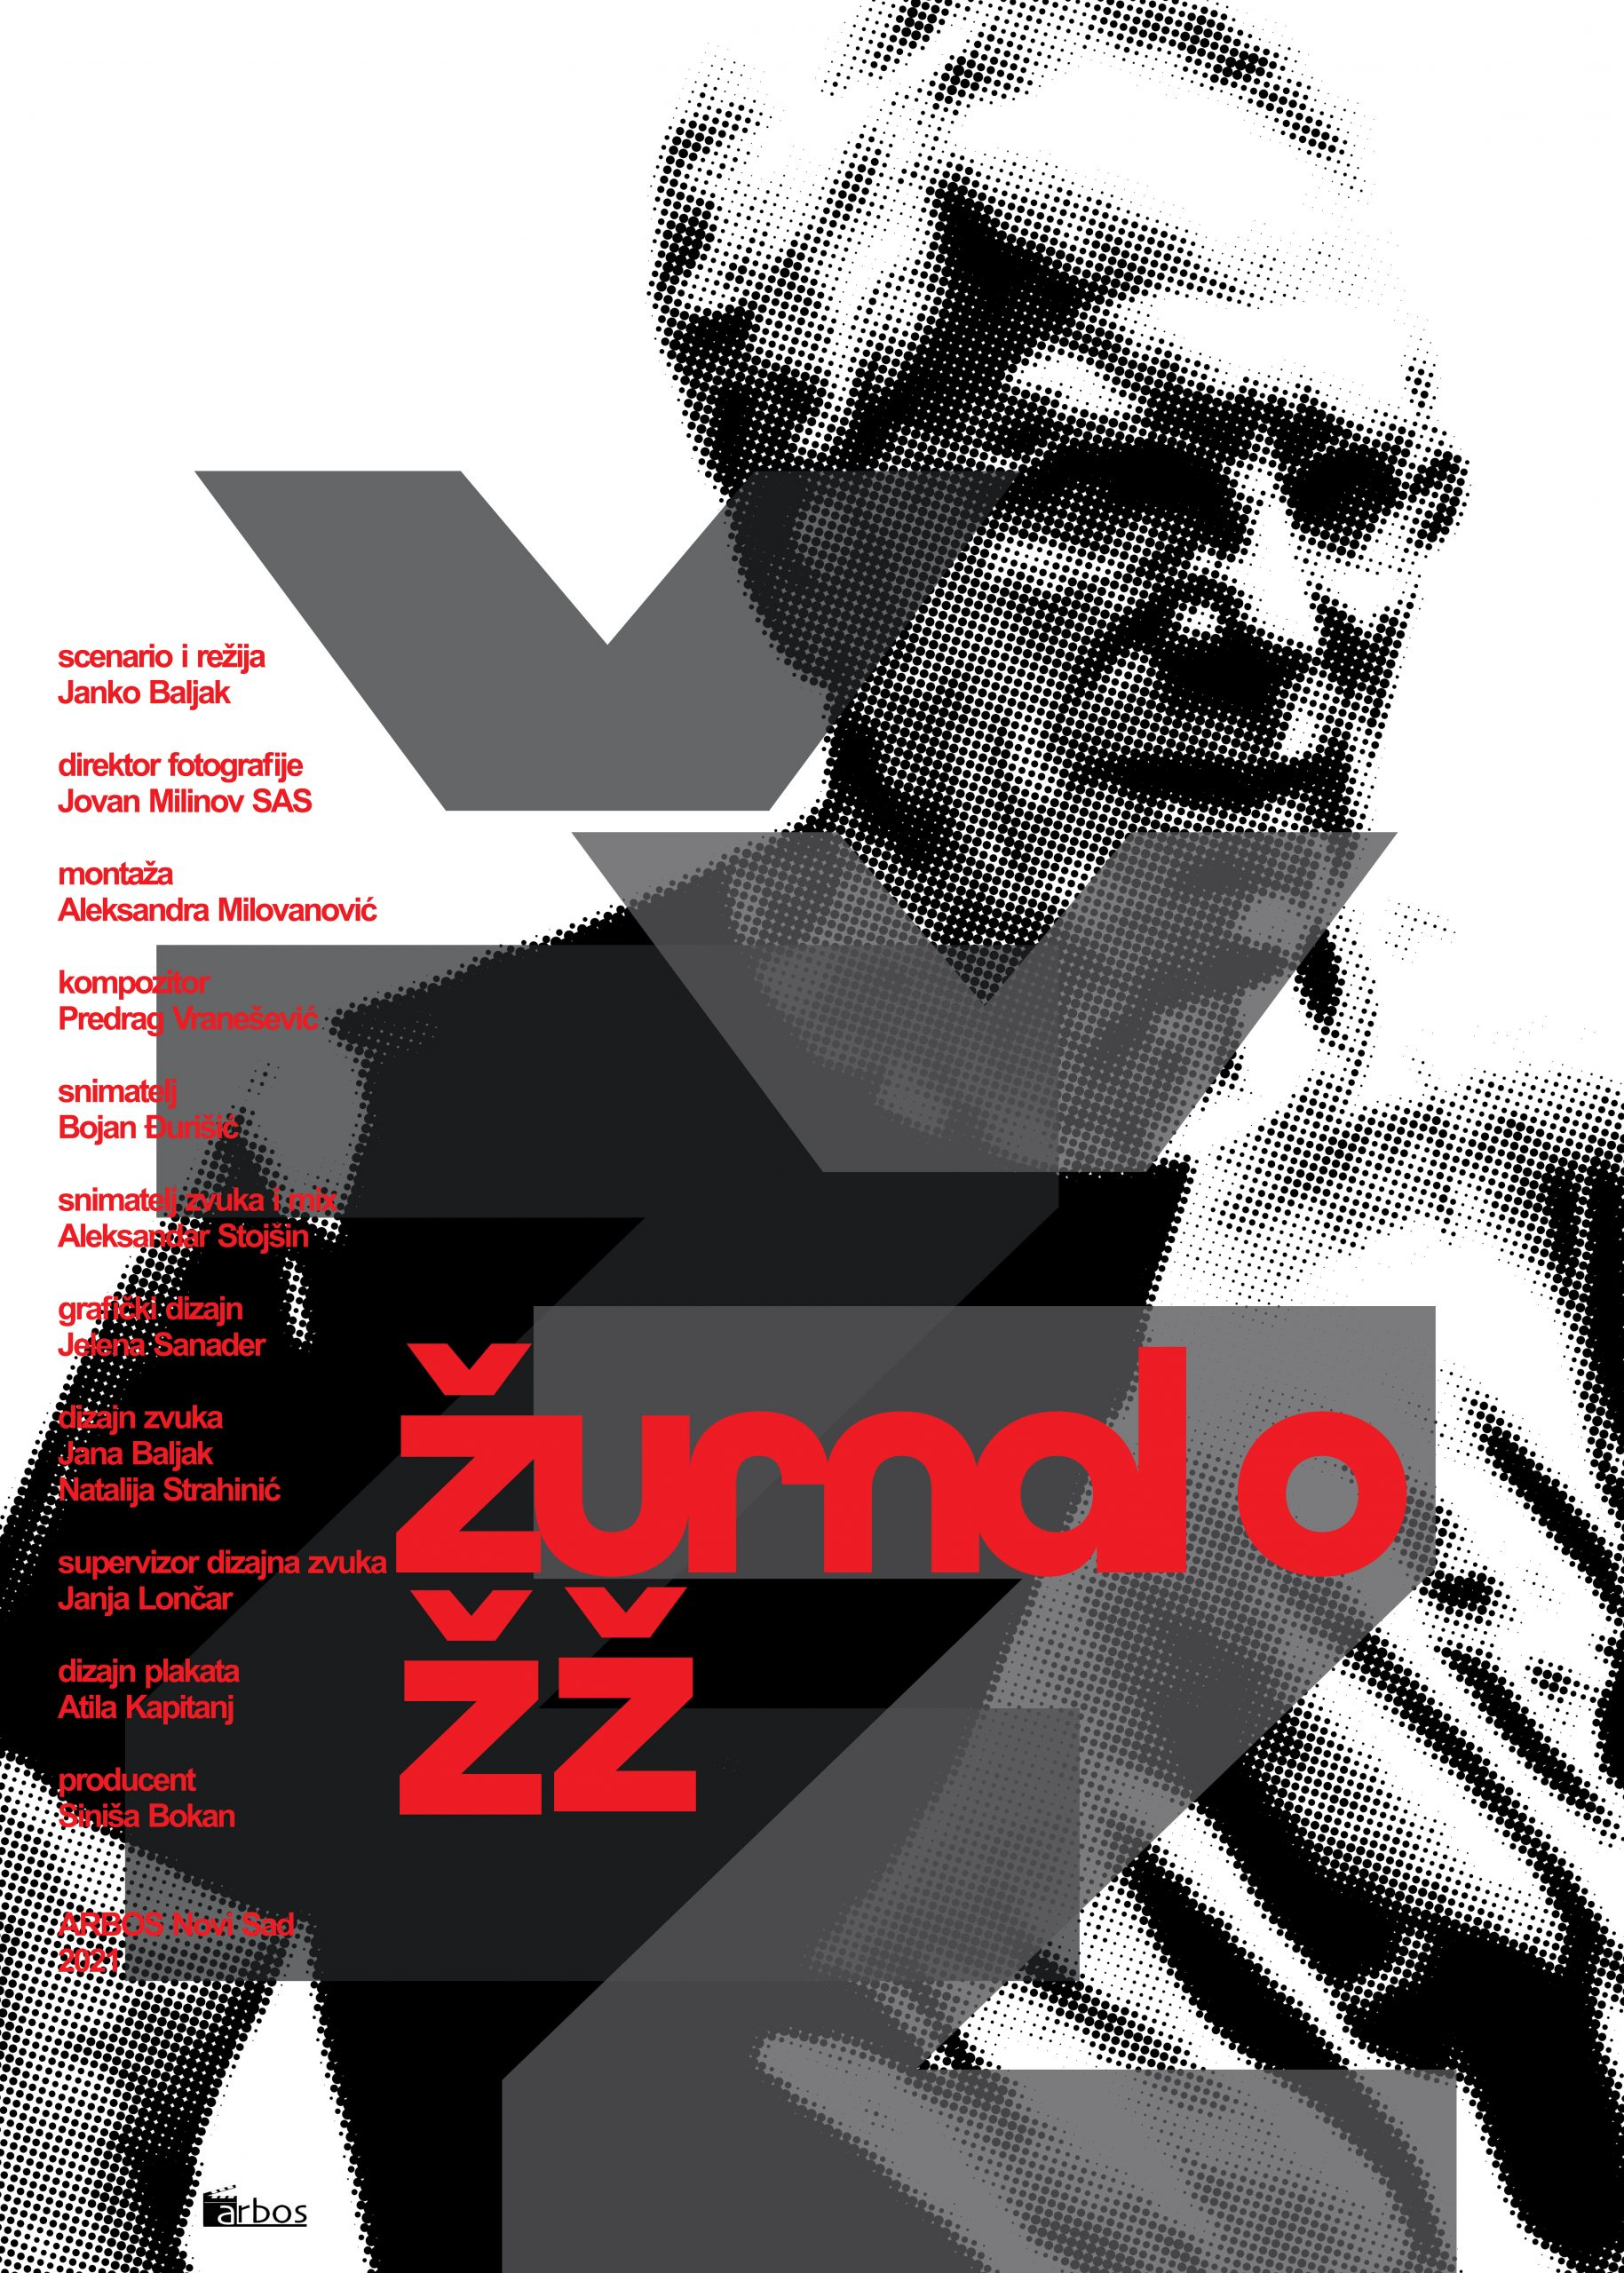 Žurnal o ŽŽ, Želimir Žilnik, reditelj, plakat, film